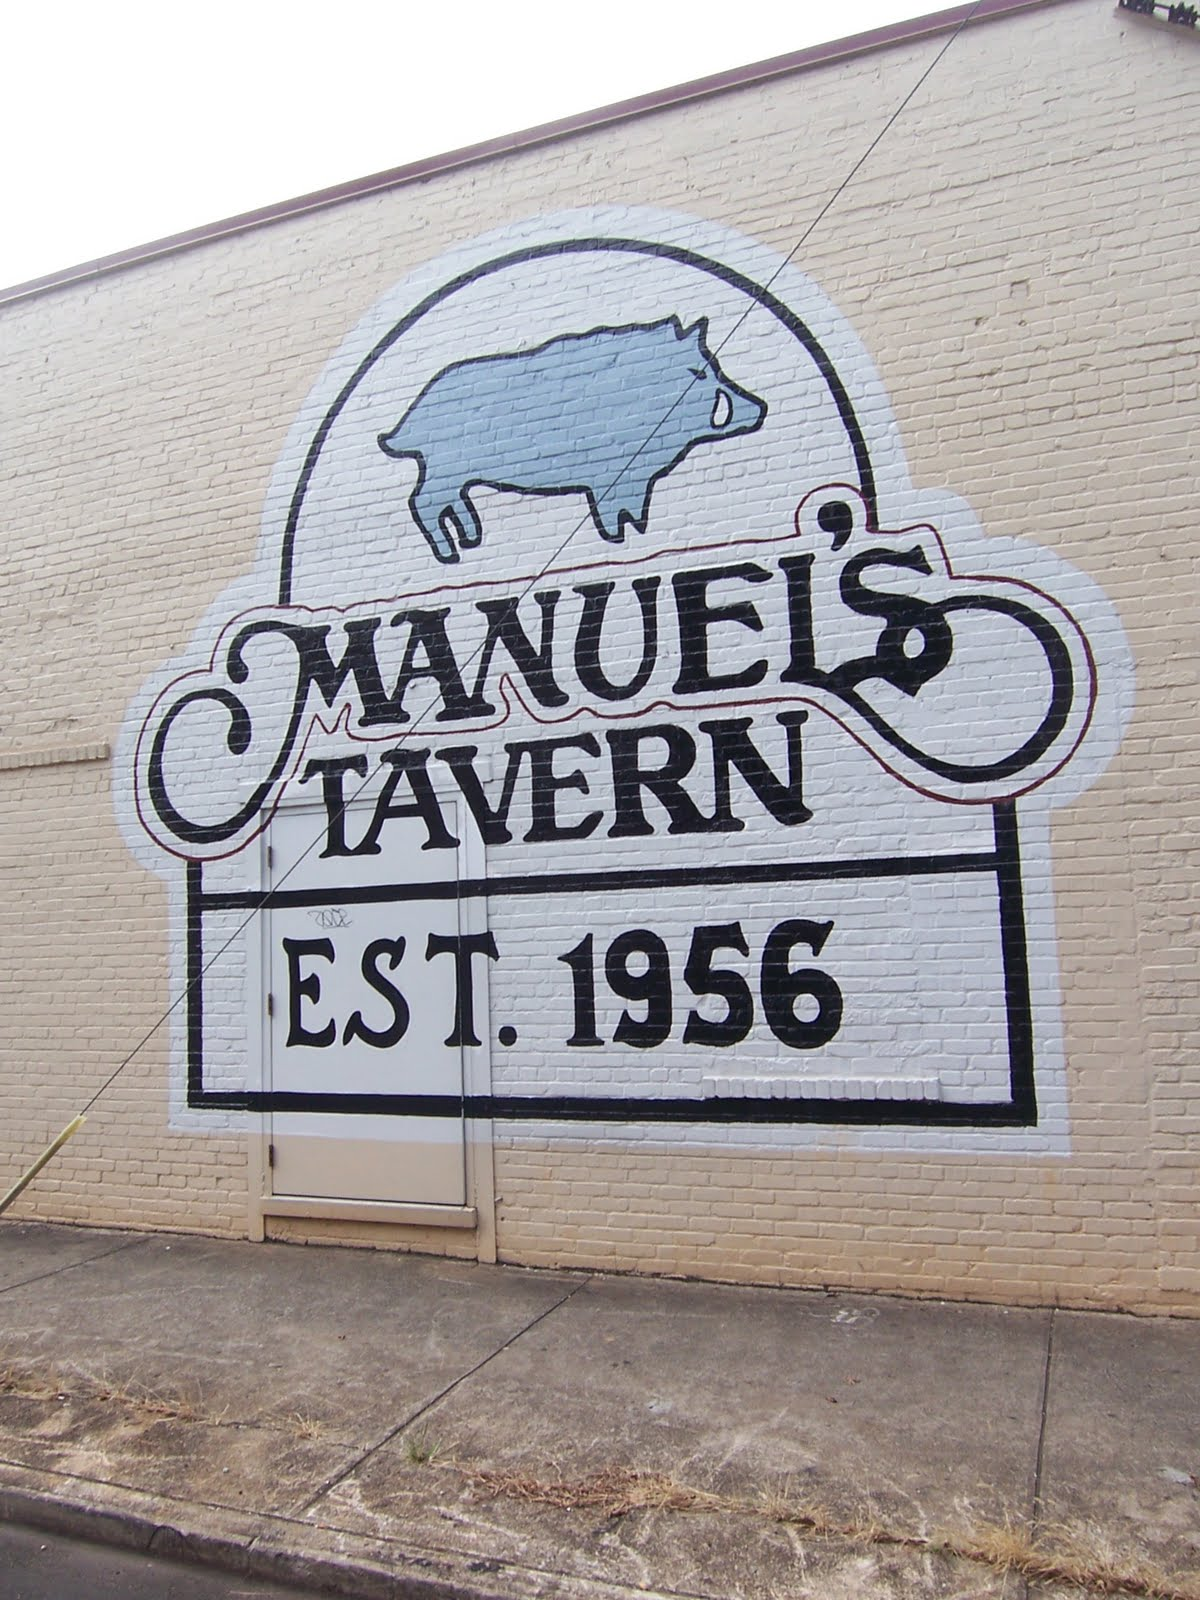 [Manuel's+Tavern+1956]